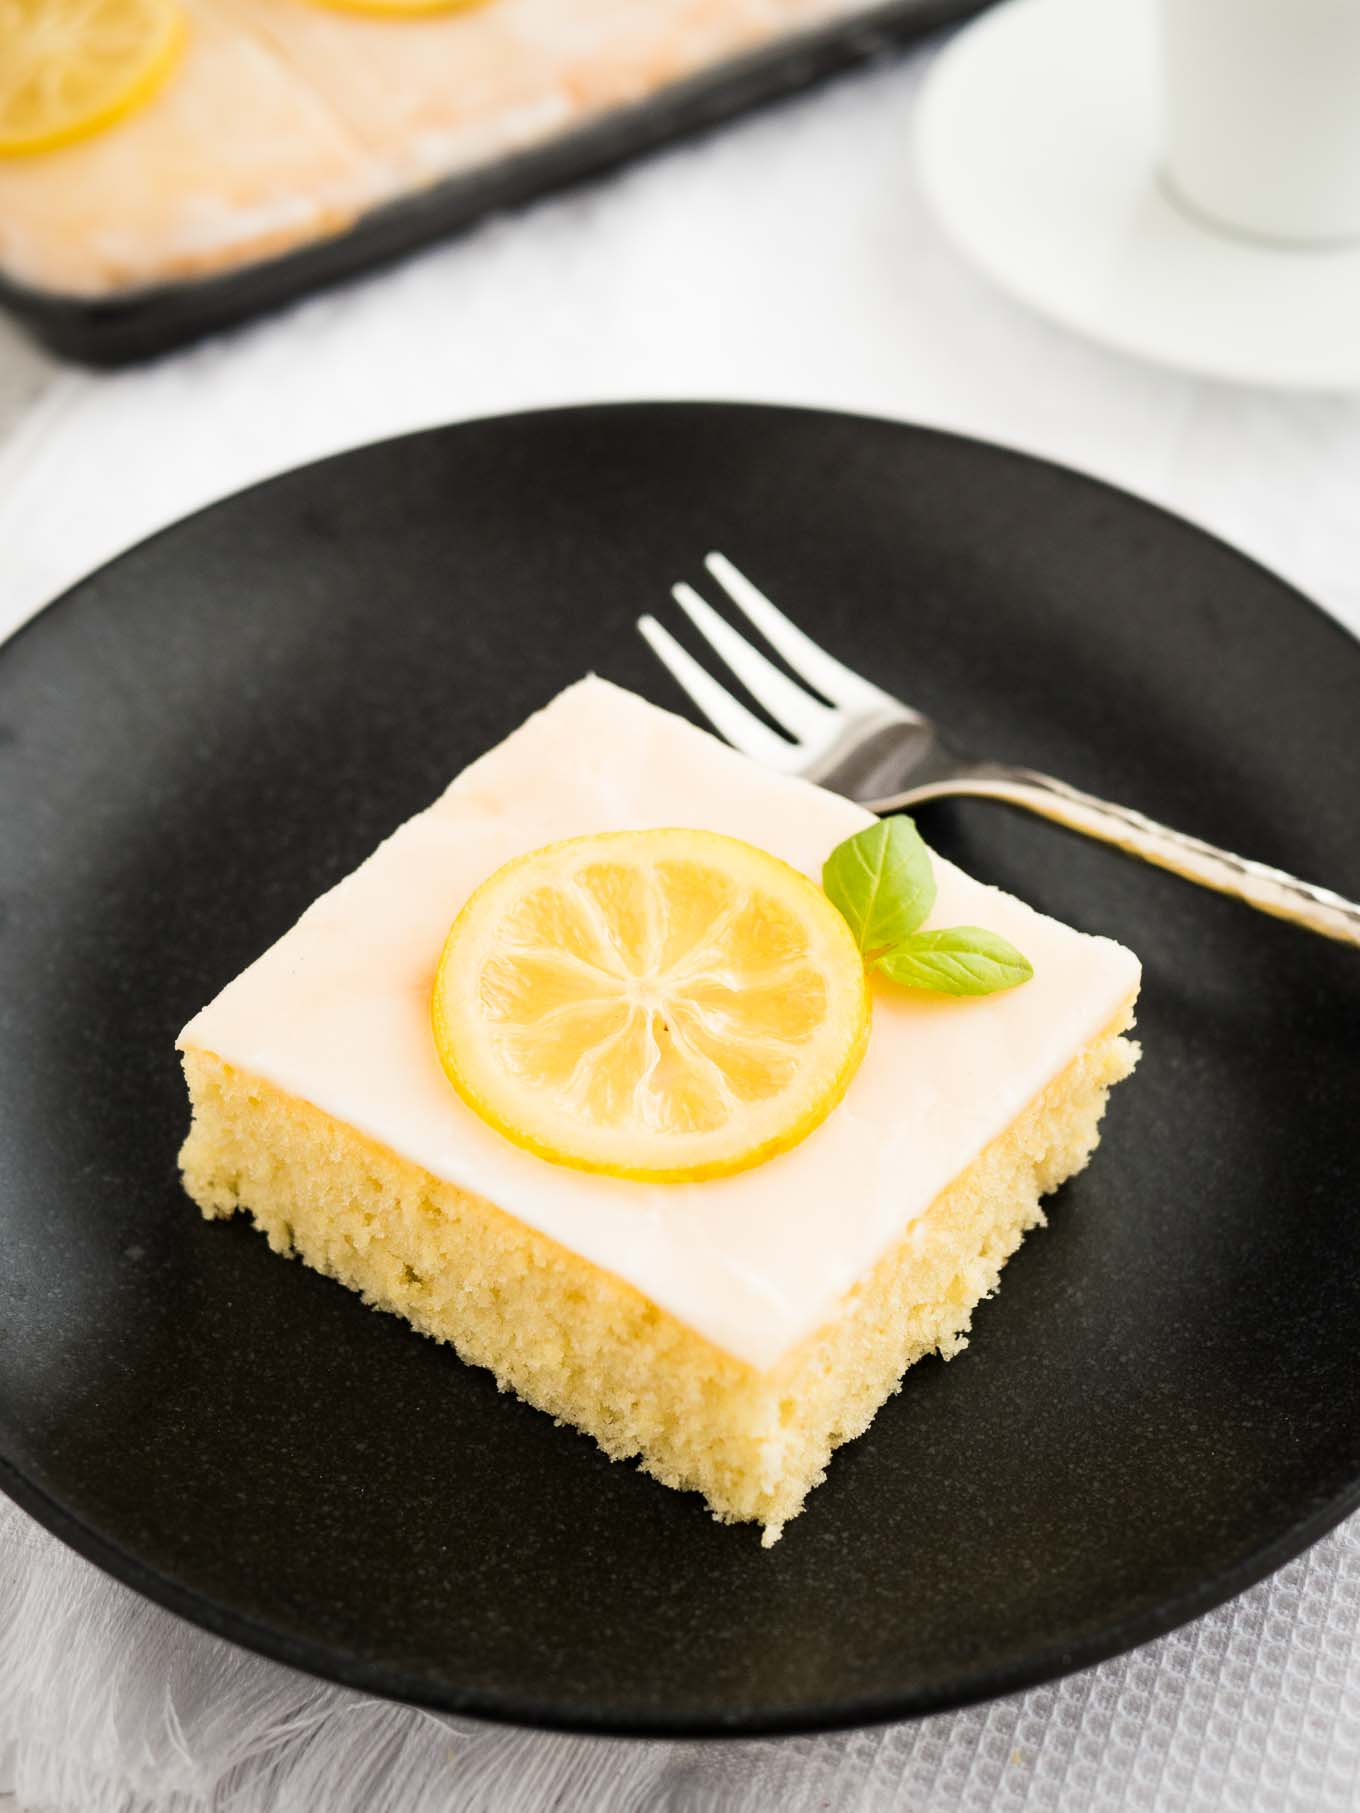 Homemade Lemon Sheet Cake Recipe